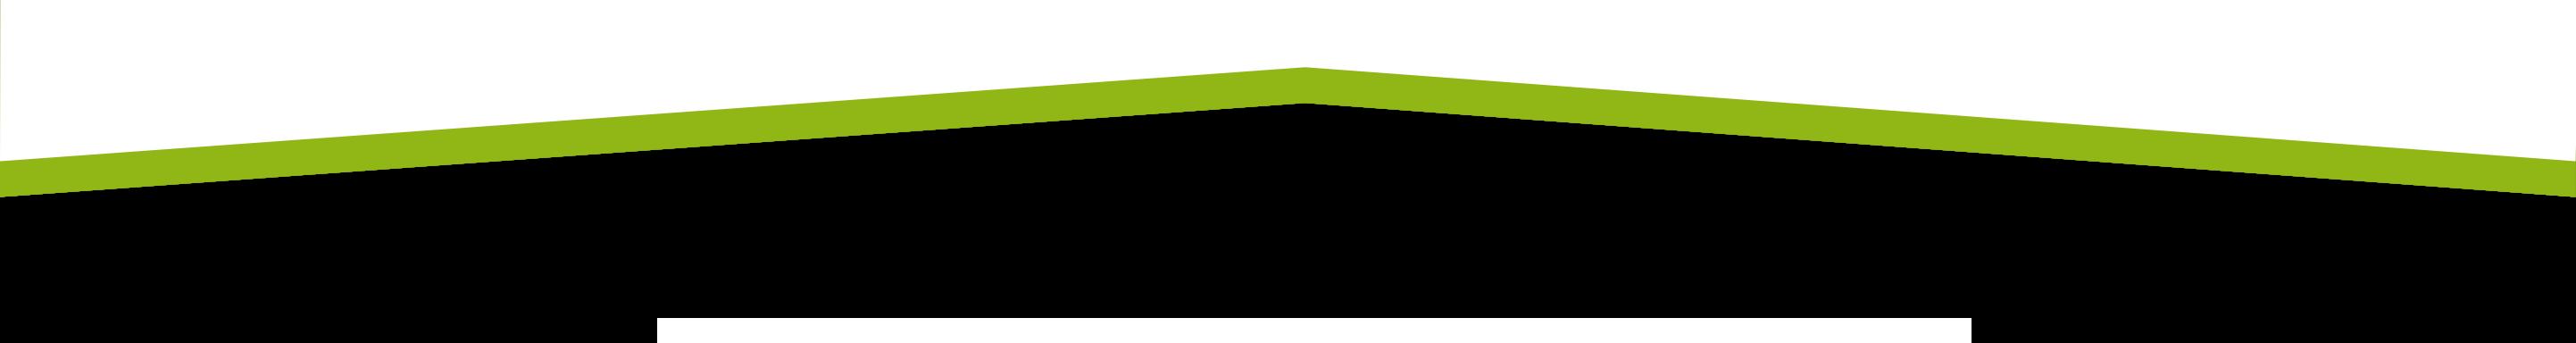 separator-green-1